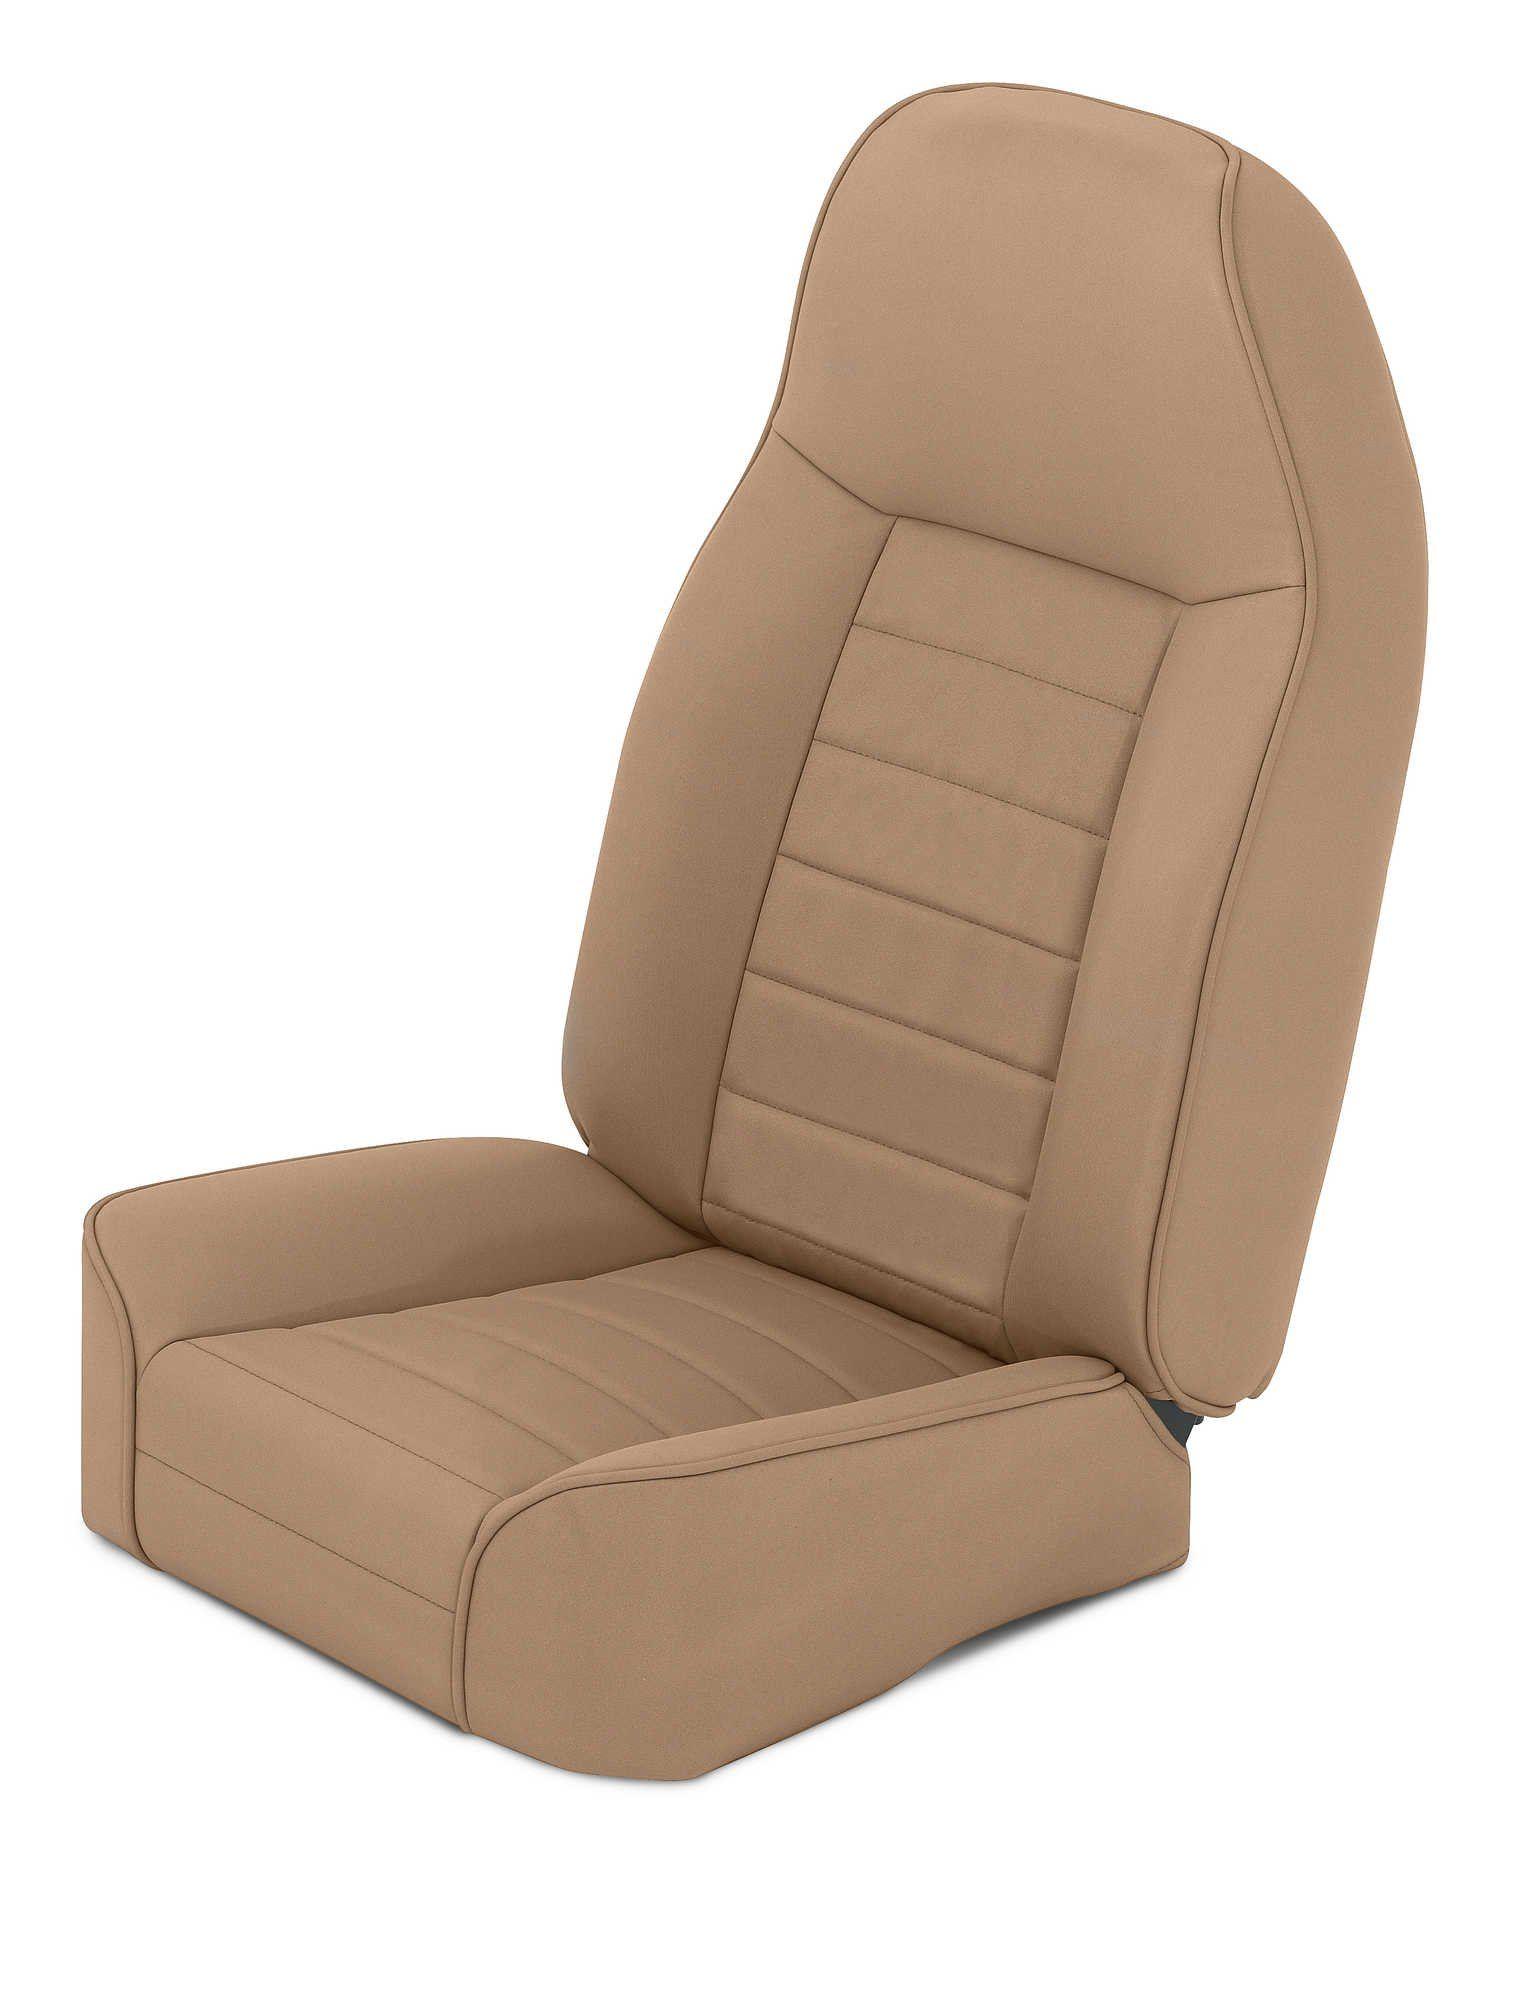 Smittybilt Standard Bucket Seat For 76 06 Jeep Cj Wrangler Yj Tj Tj Unlimited Jeep Jeep Cj Jeep Seats